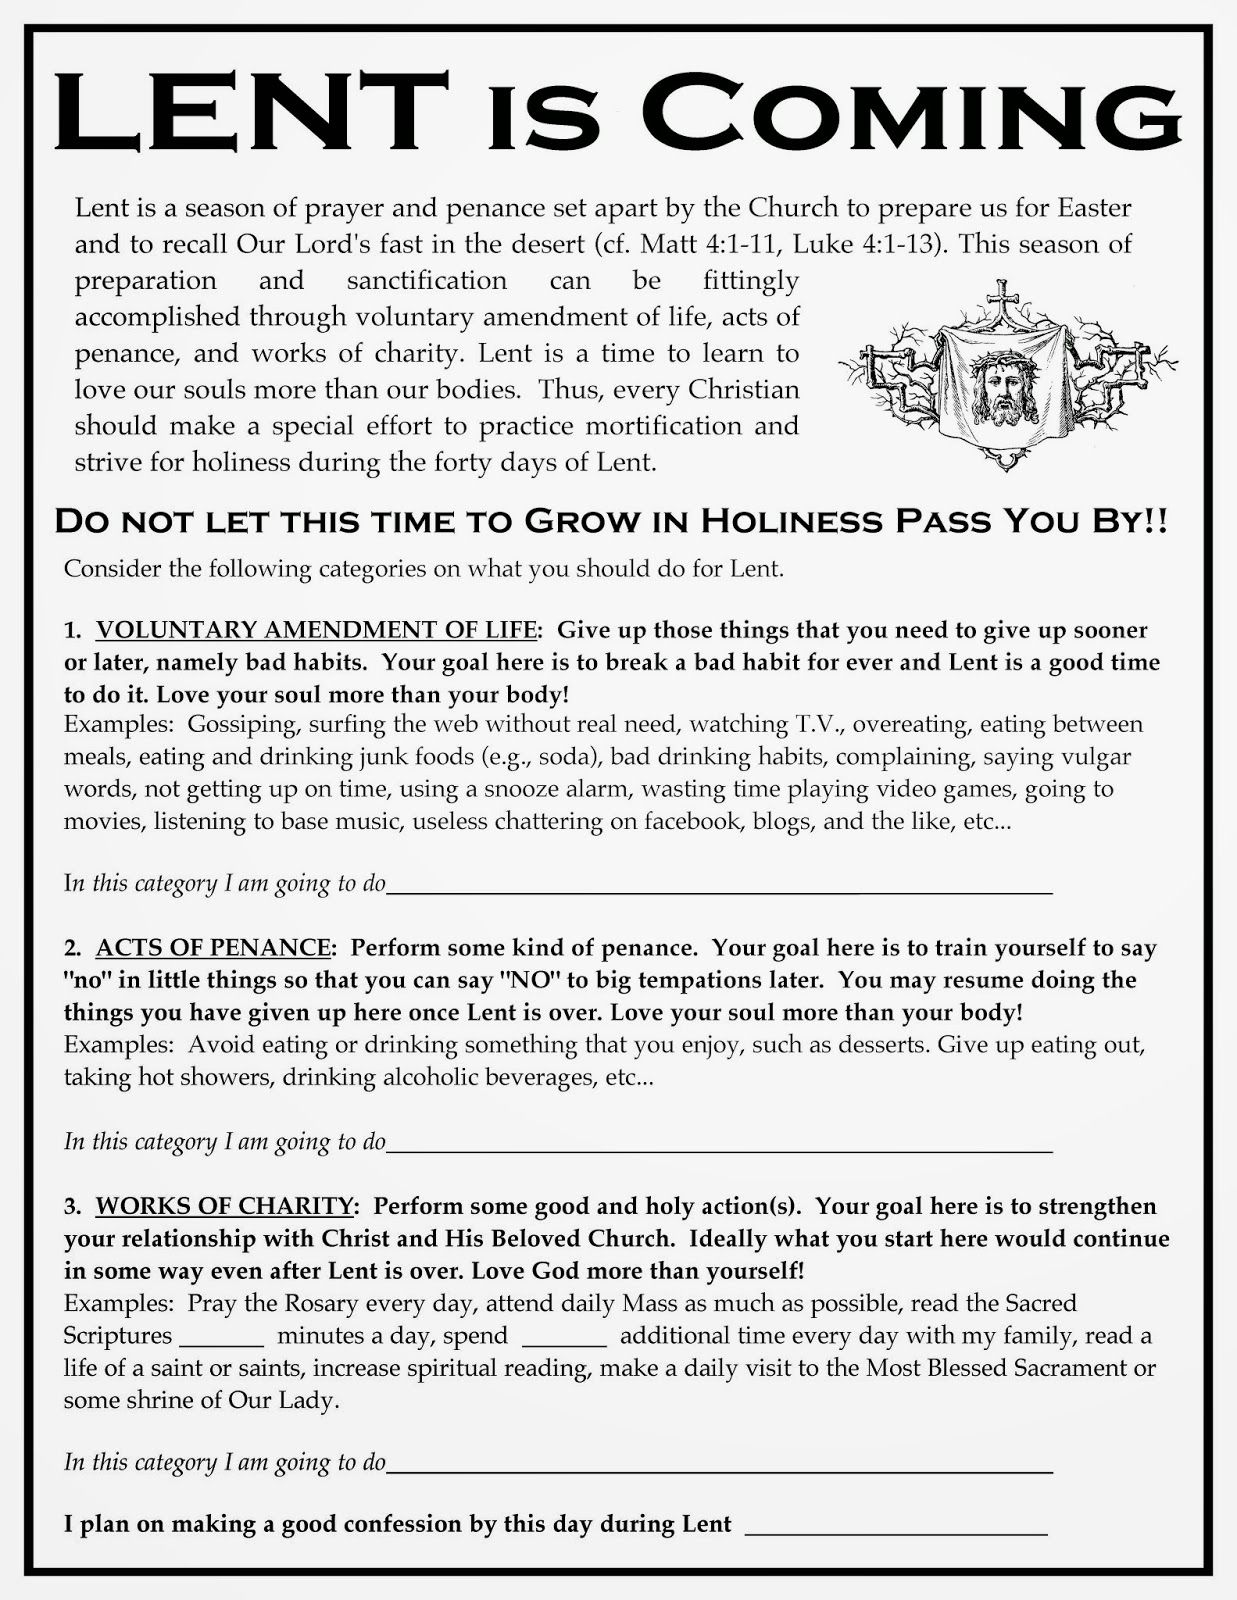 Worksheets Catholic Worksheets rorate lent is coming time to prepare printable worksheet